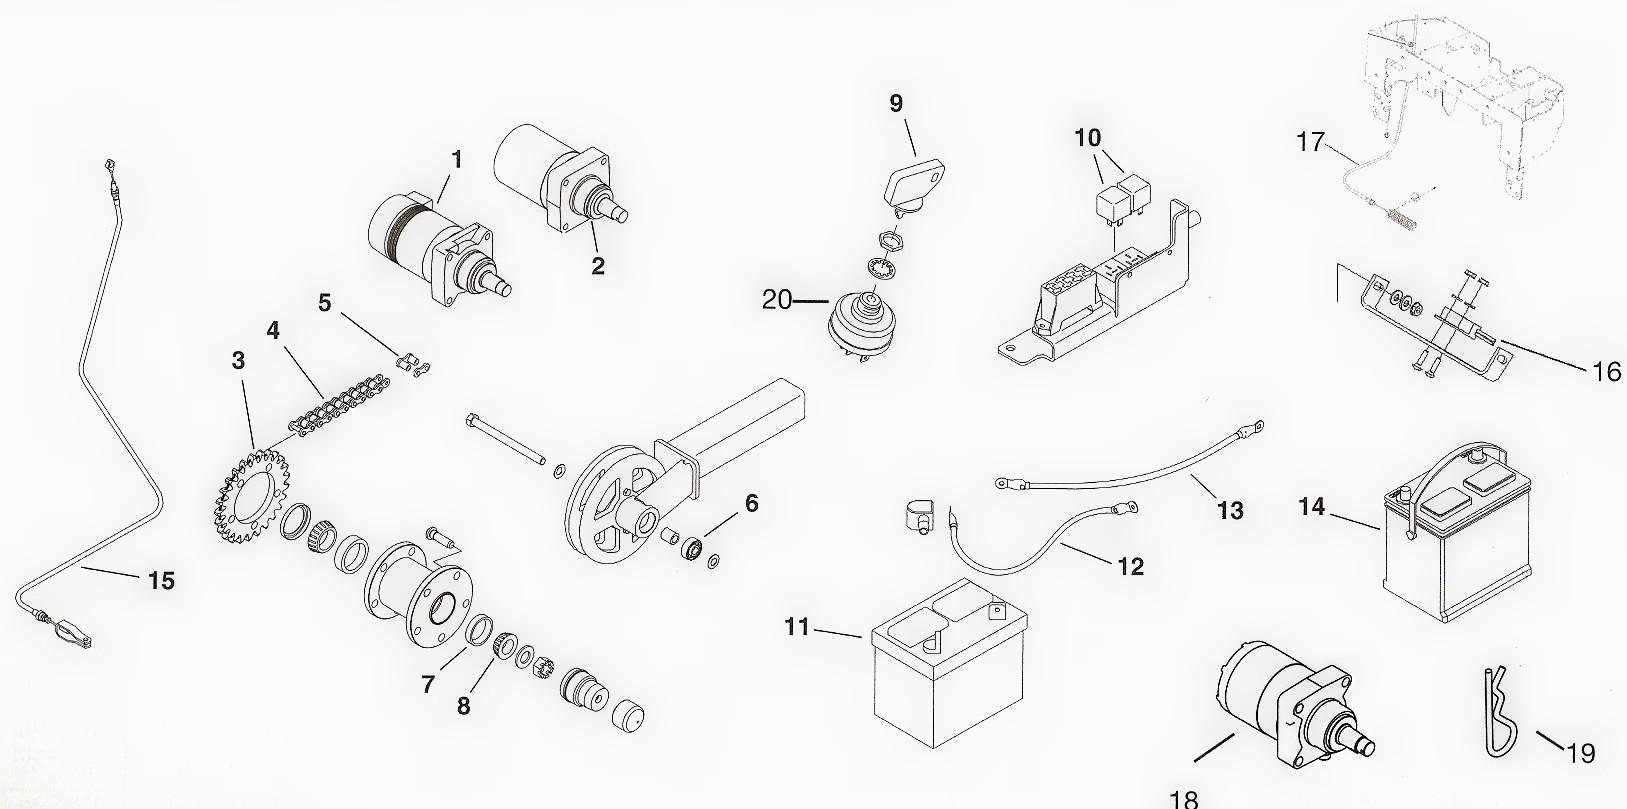 toro groundsmaster 325d wiring diagram